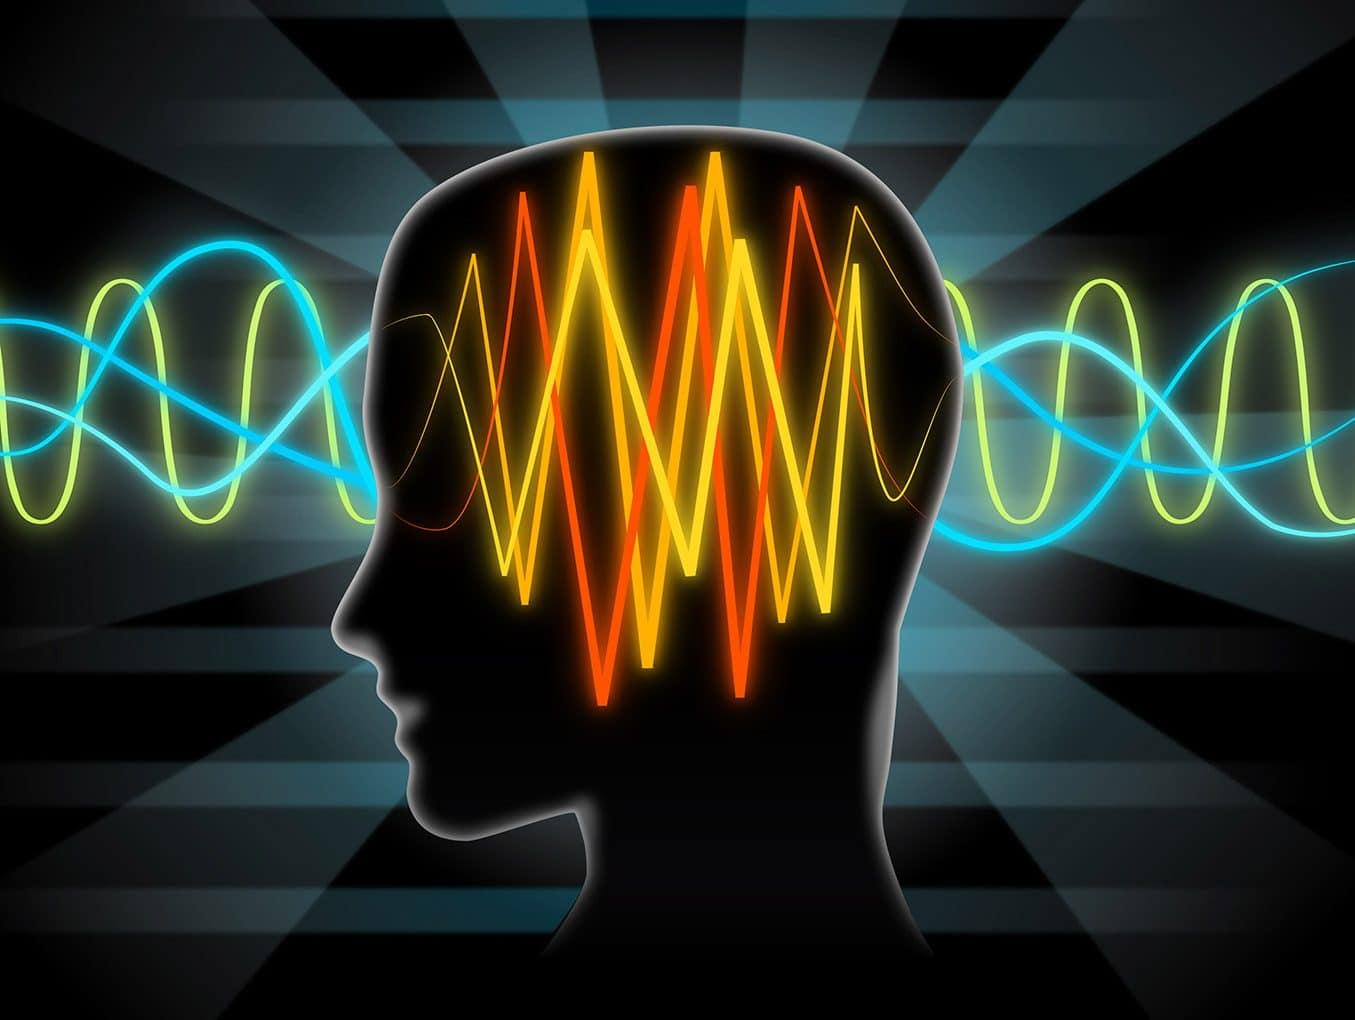 O cérebro ou a mente – qual deles comanda a dor crônica?